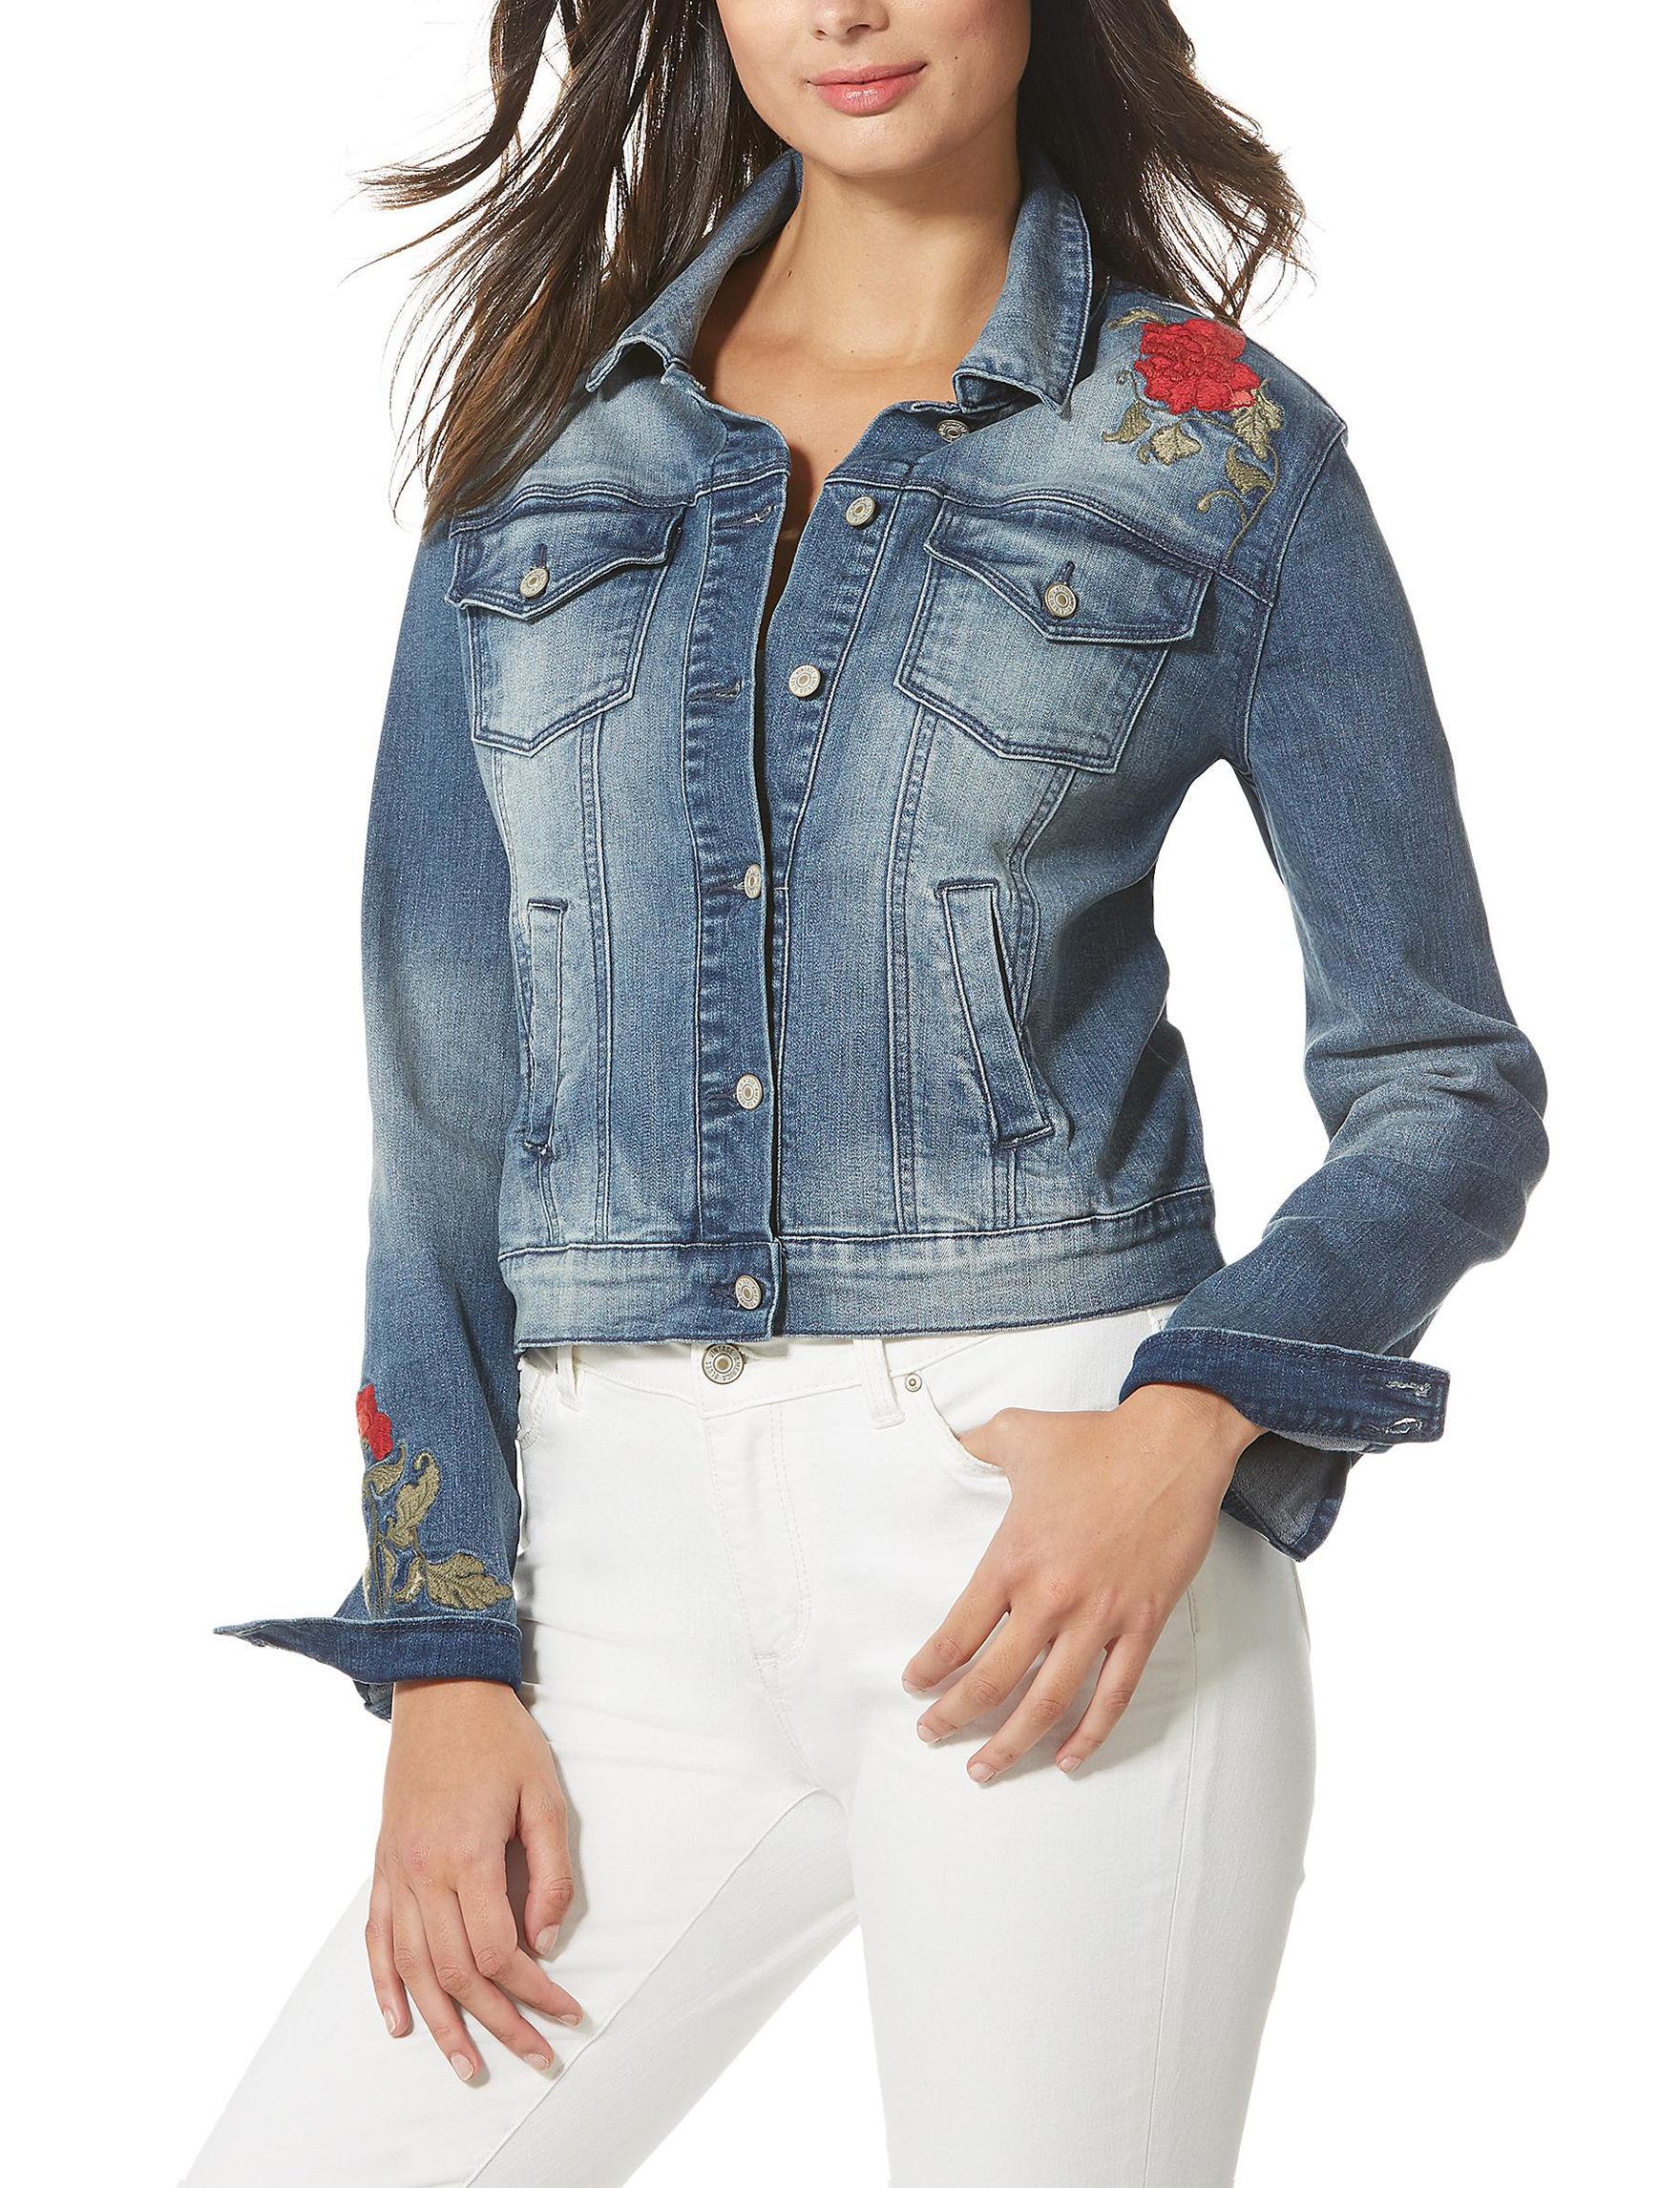 Vintage America Blues Medium Wash Denim Jackets